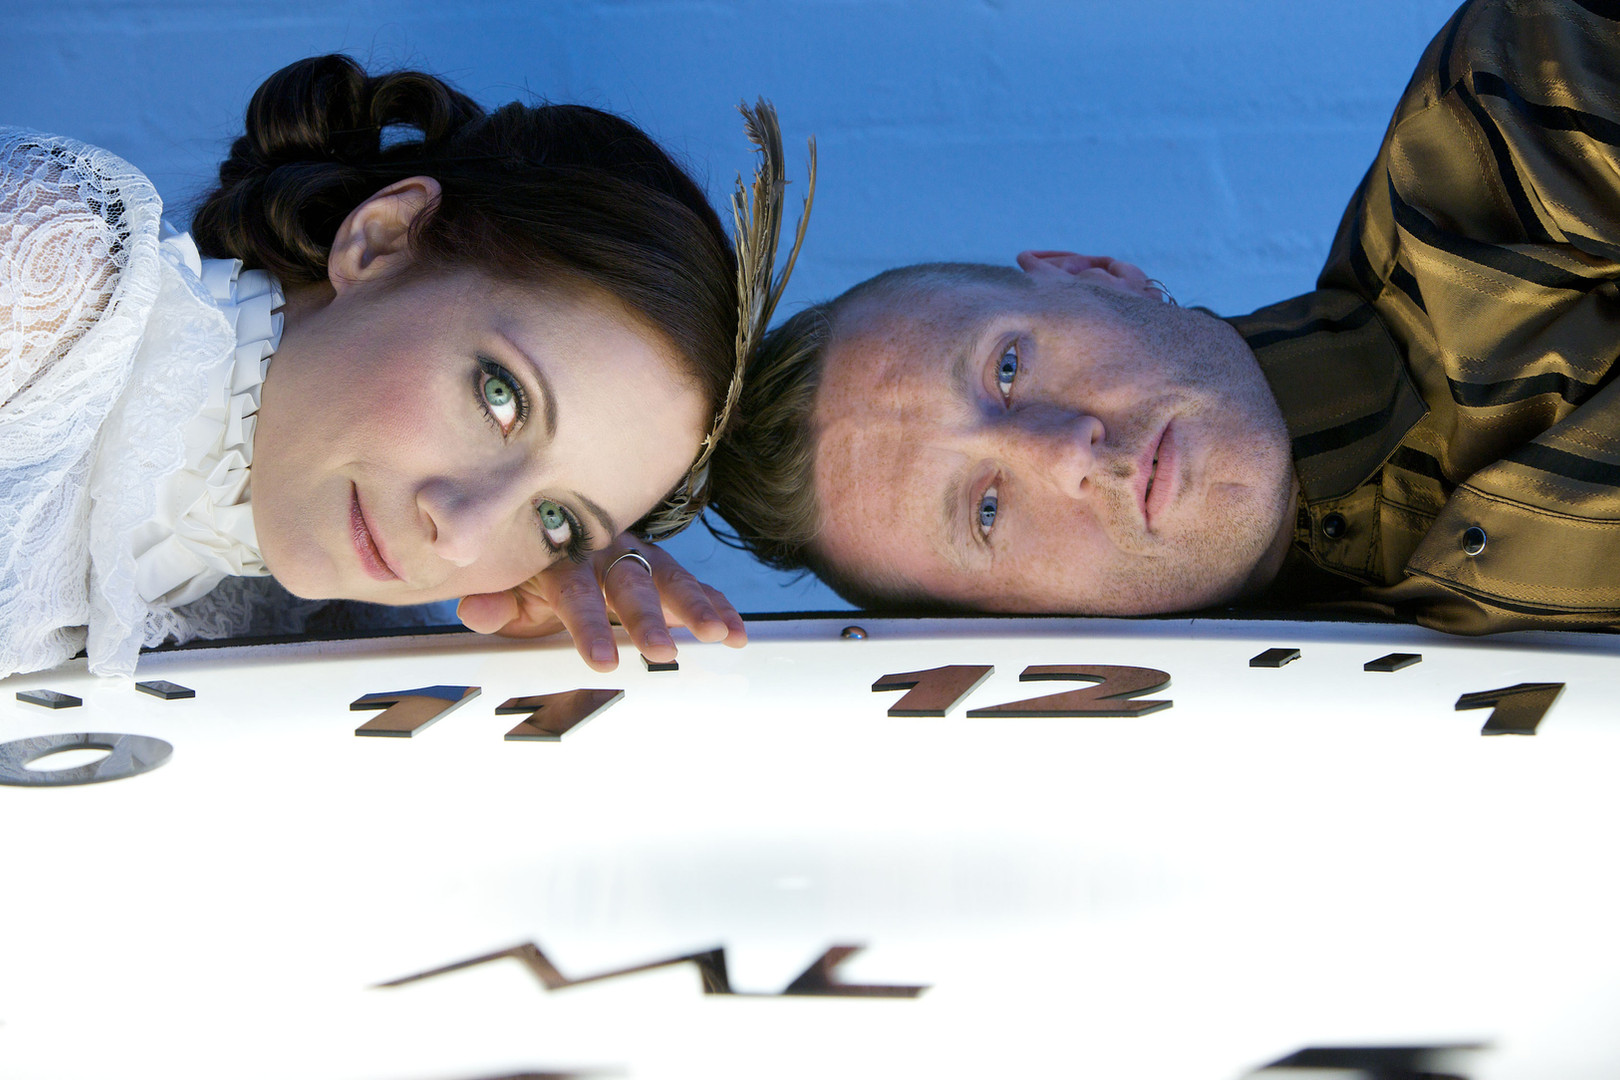 Doris Brendel & Lee Dunham - Not Utopia 227